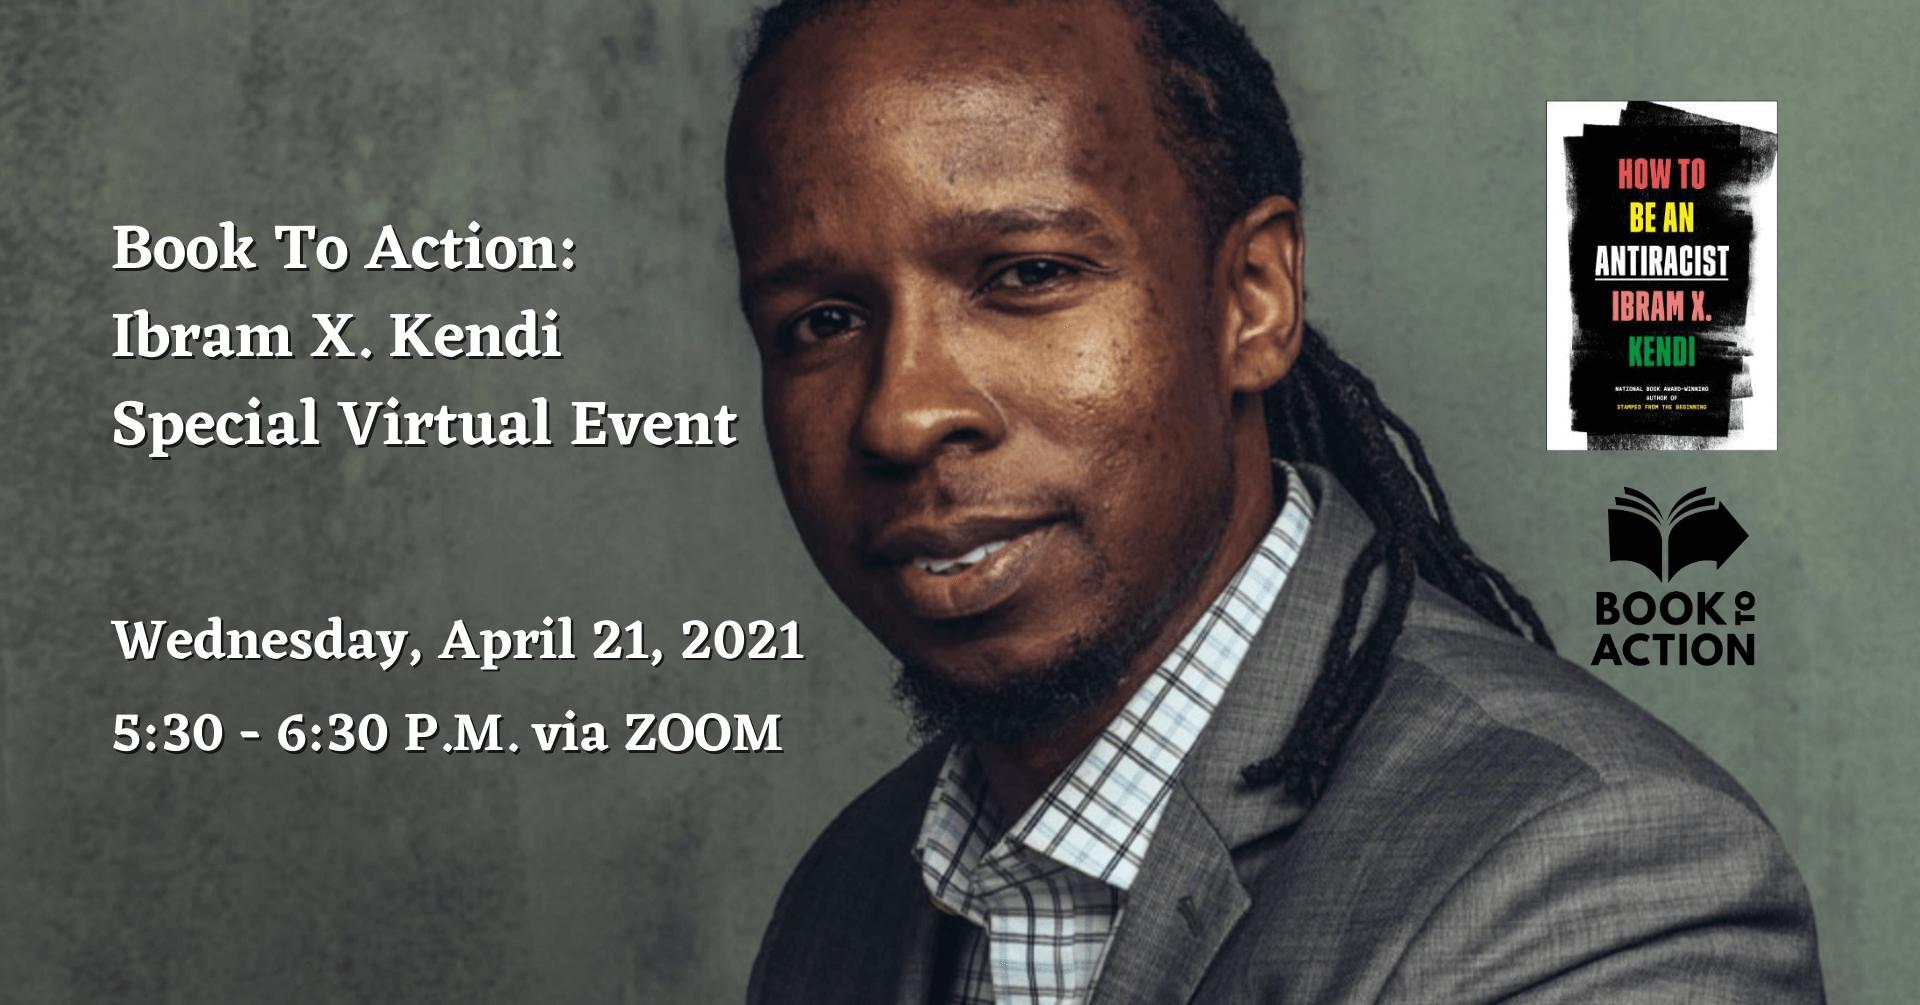 Ibram X. Kendi special virtual event. April 21, 2021 at 5:30 pm via Zoom